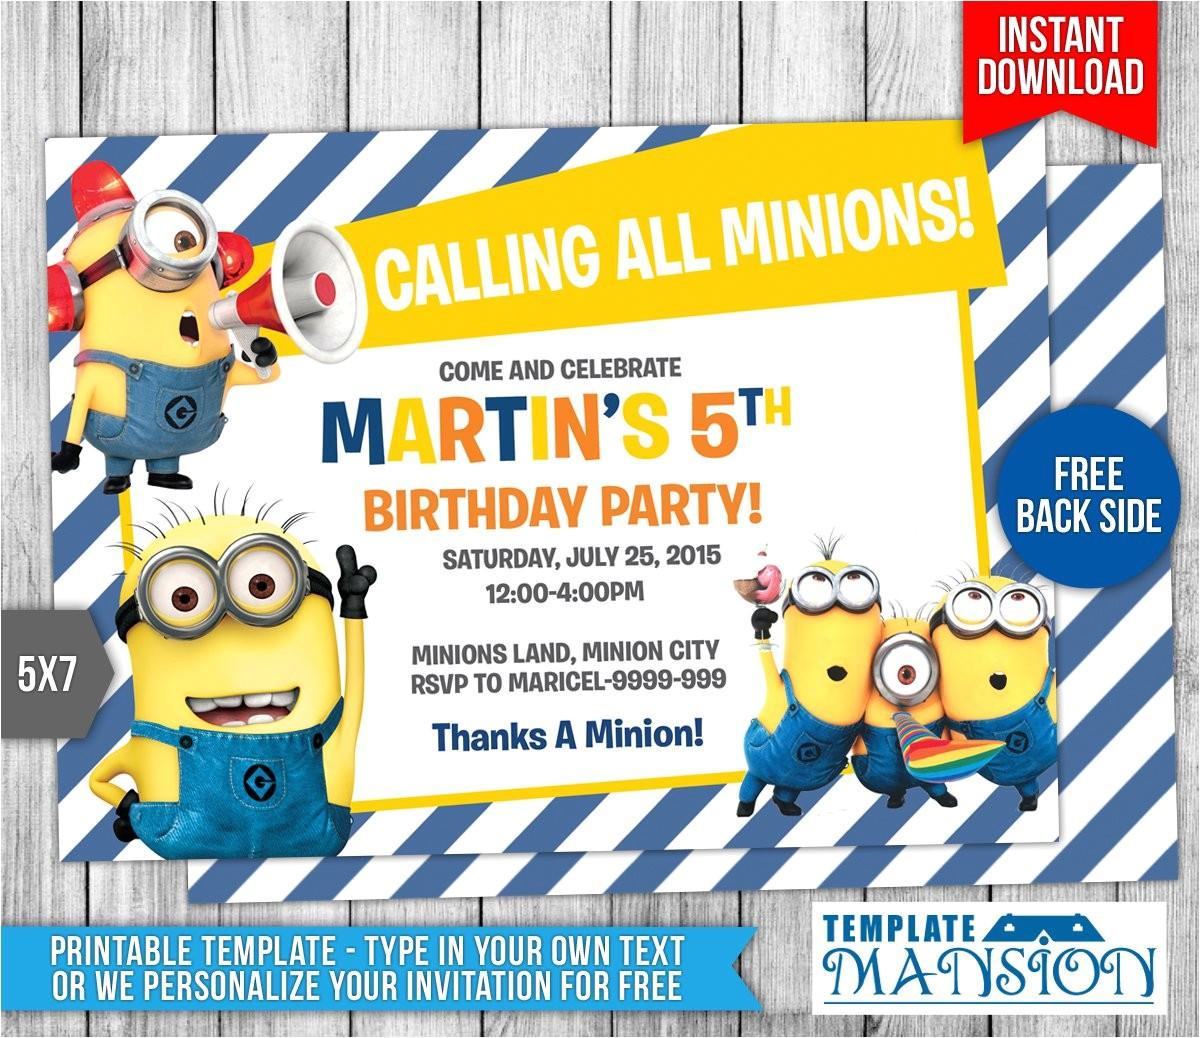 Minions Party Invites Minion Birthday Invitations Best Party Ideas